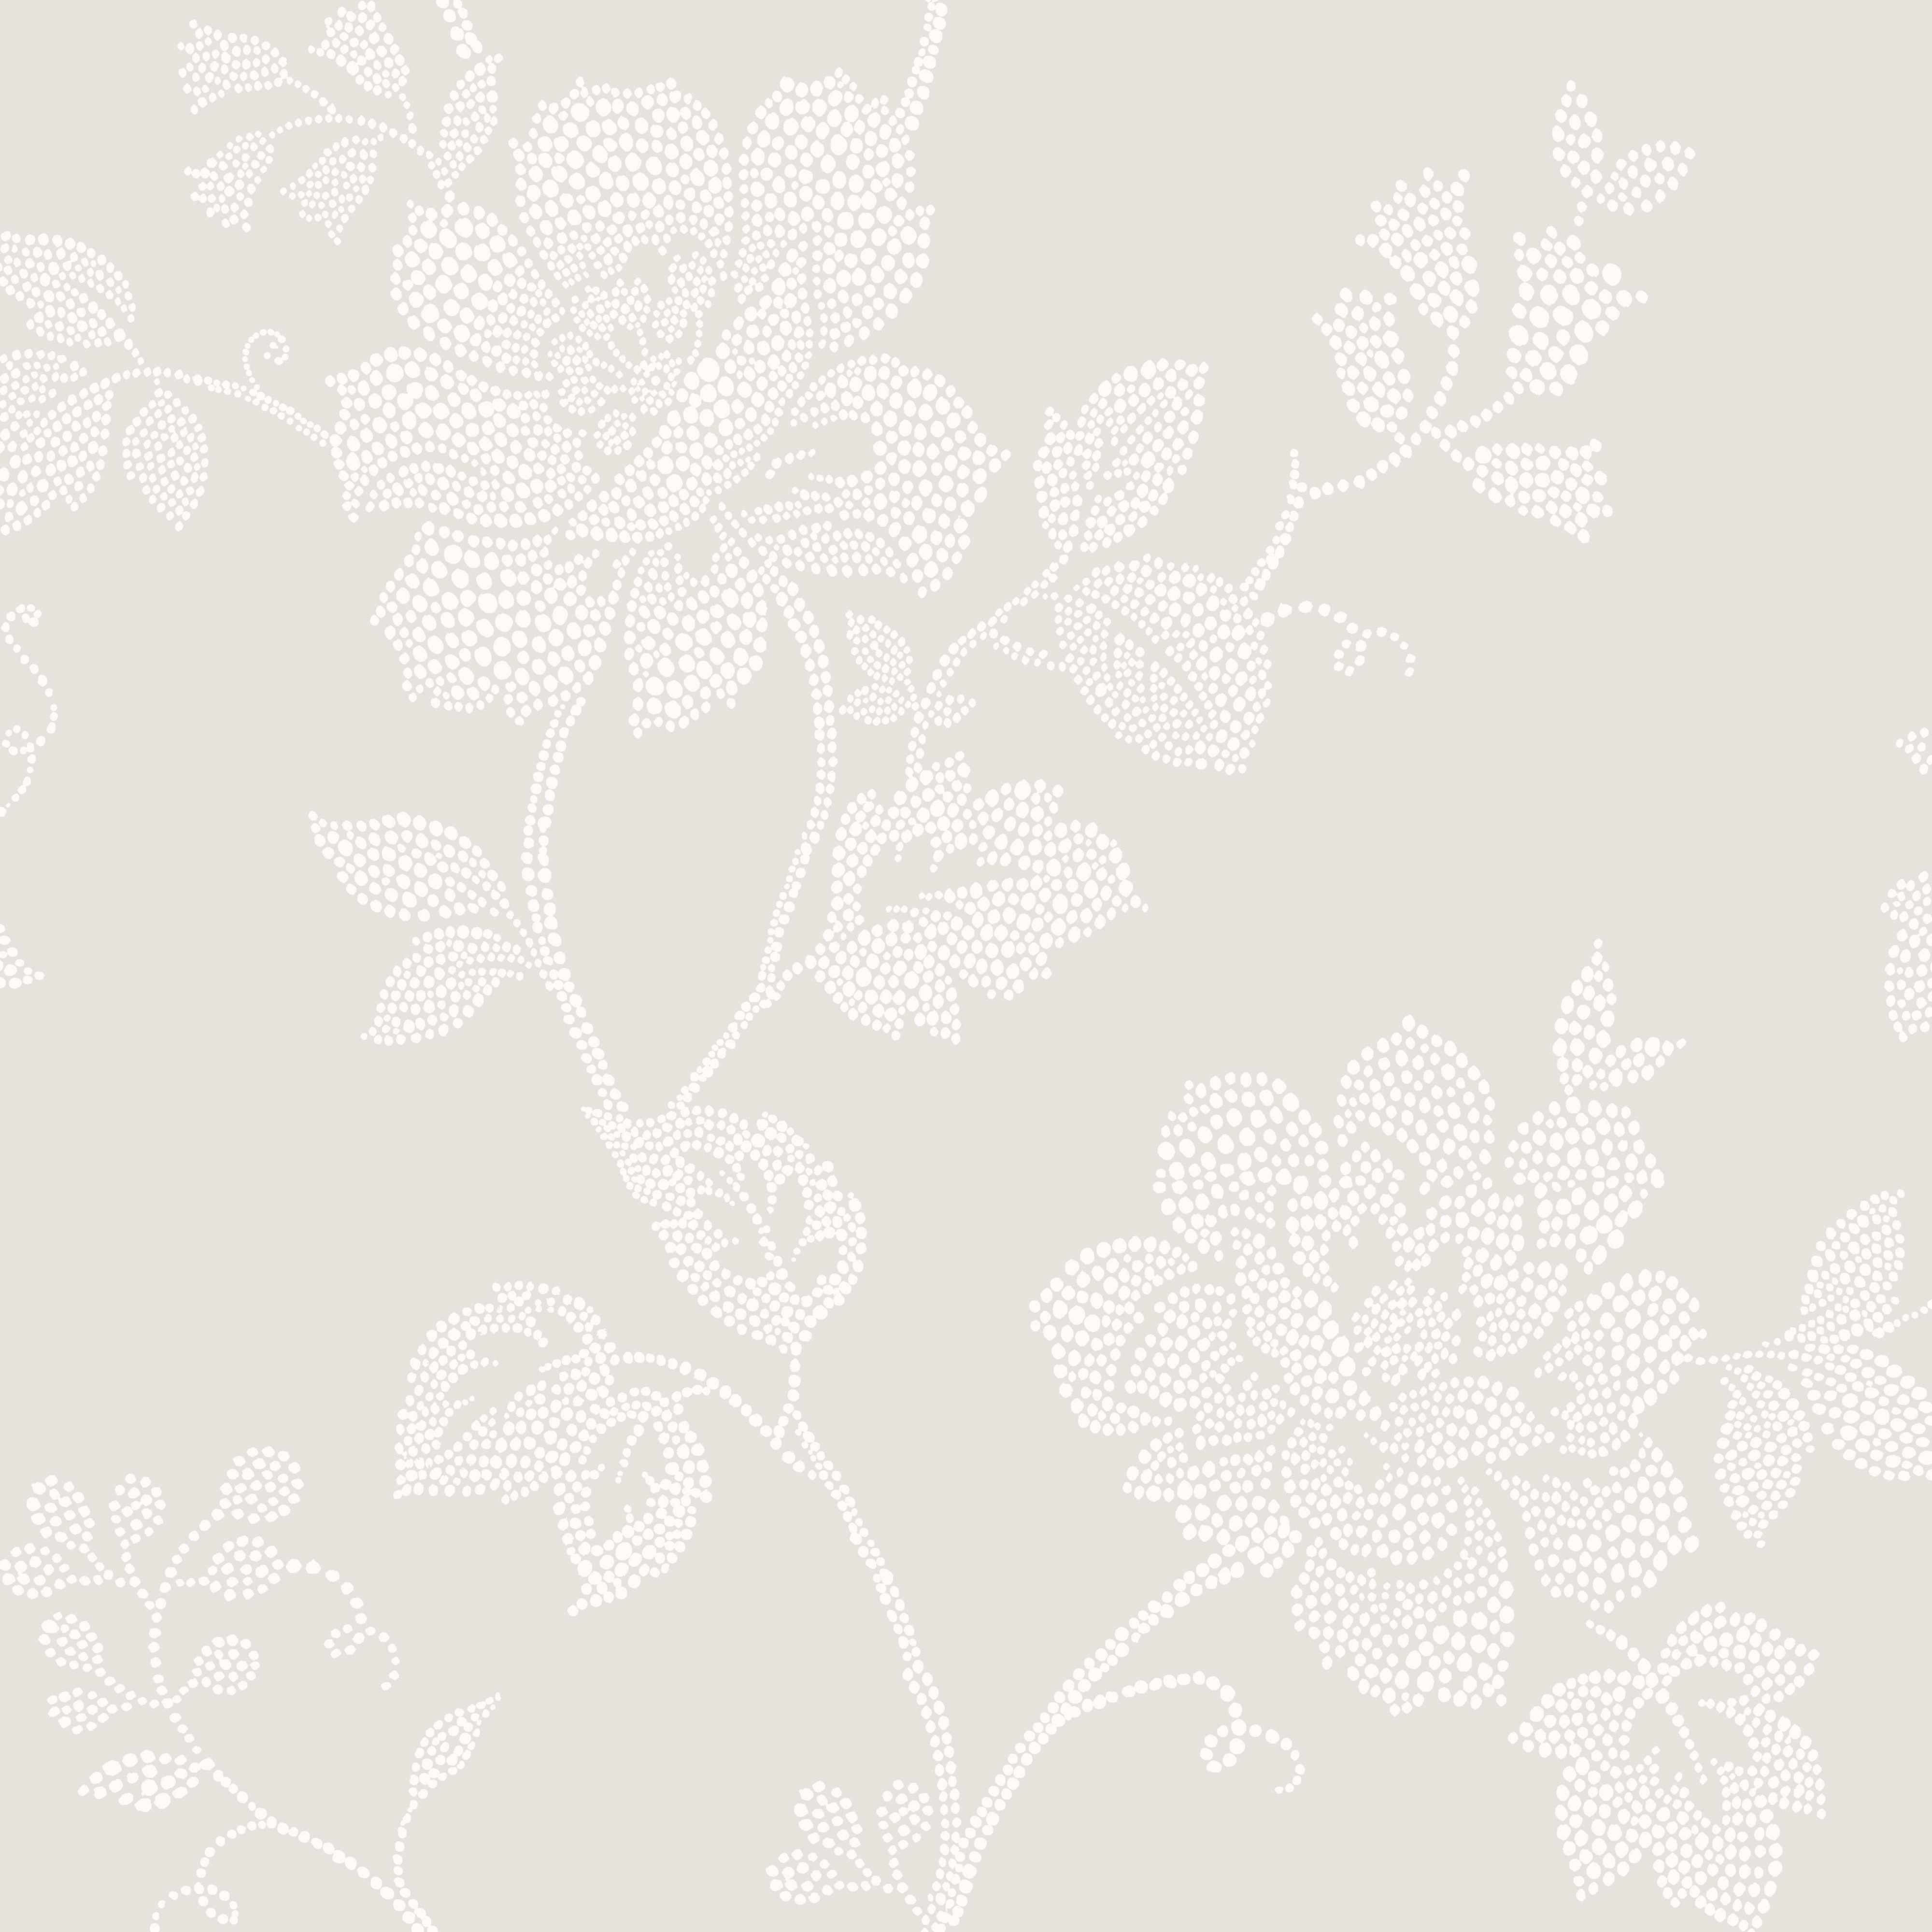 Home diy wallpaper illustration arthouse imagine fern plum motif vinyl - Colours Tara Dot French Grey Floral Wallpaper